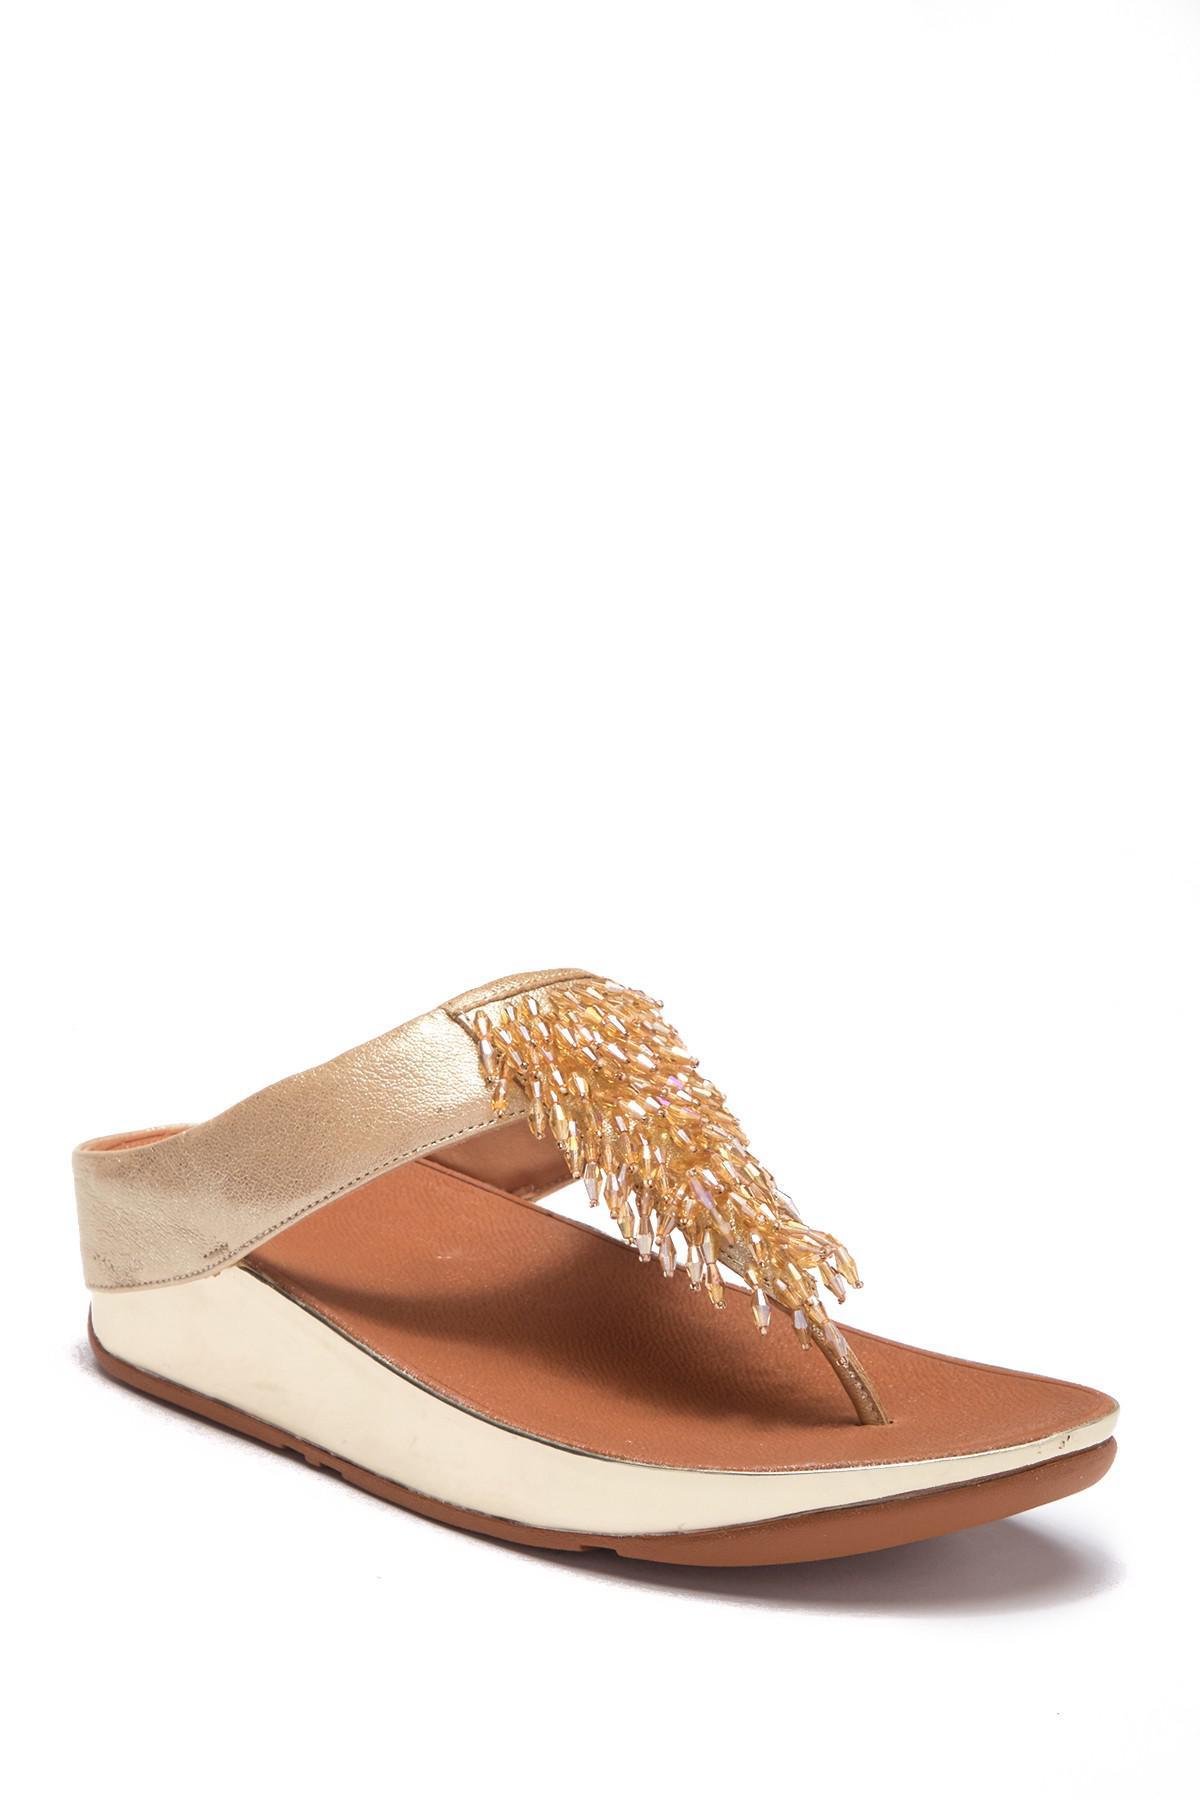 0e2ce60c5 Lyst - Fitflop Rumba Toe-thong Sandal